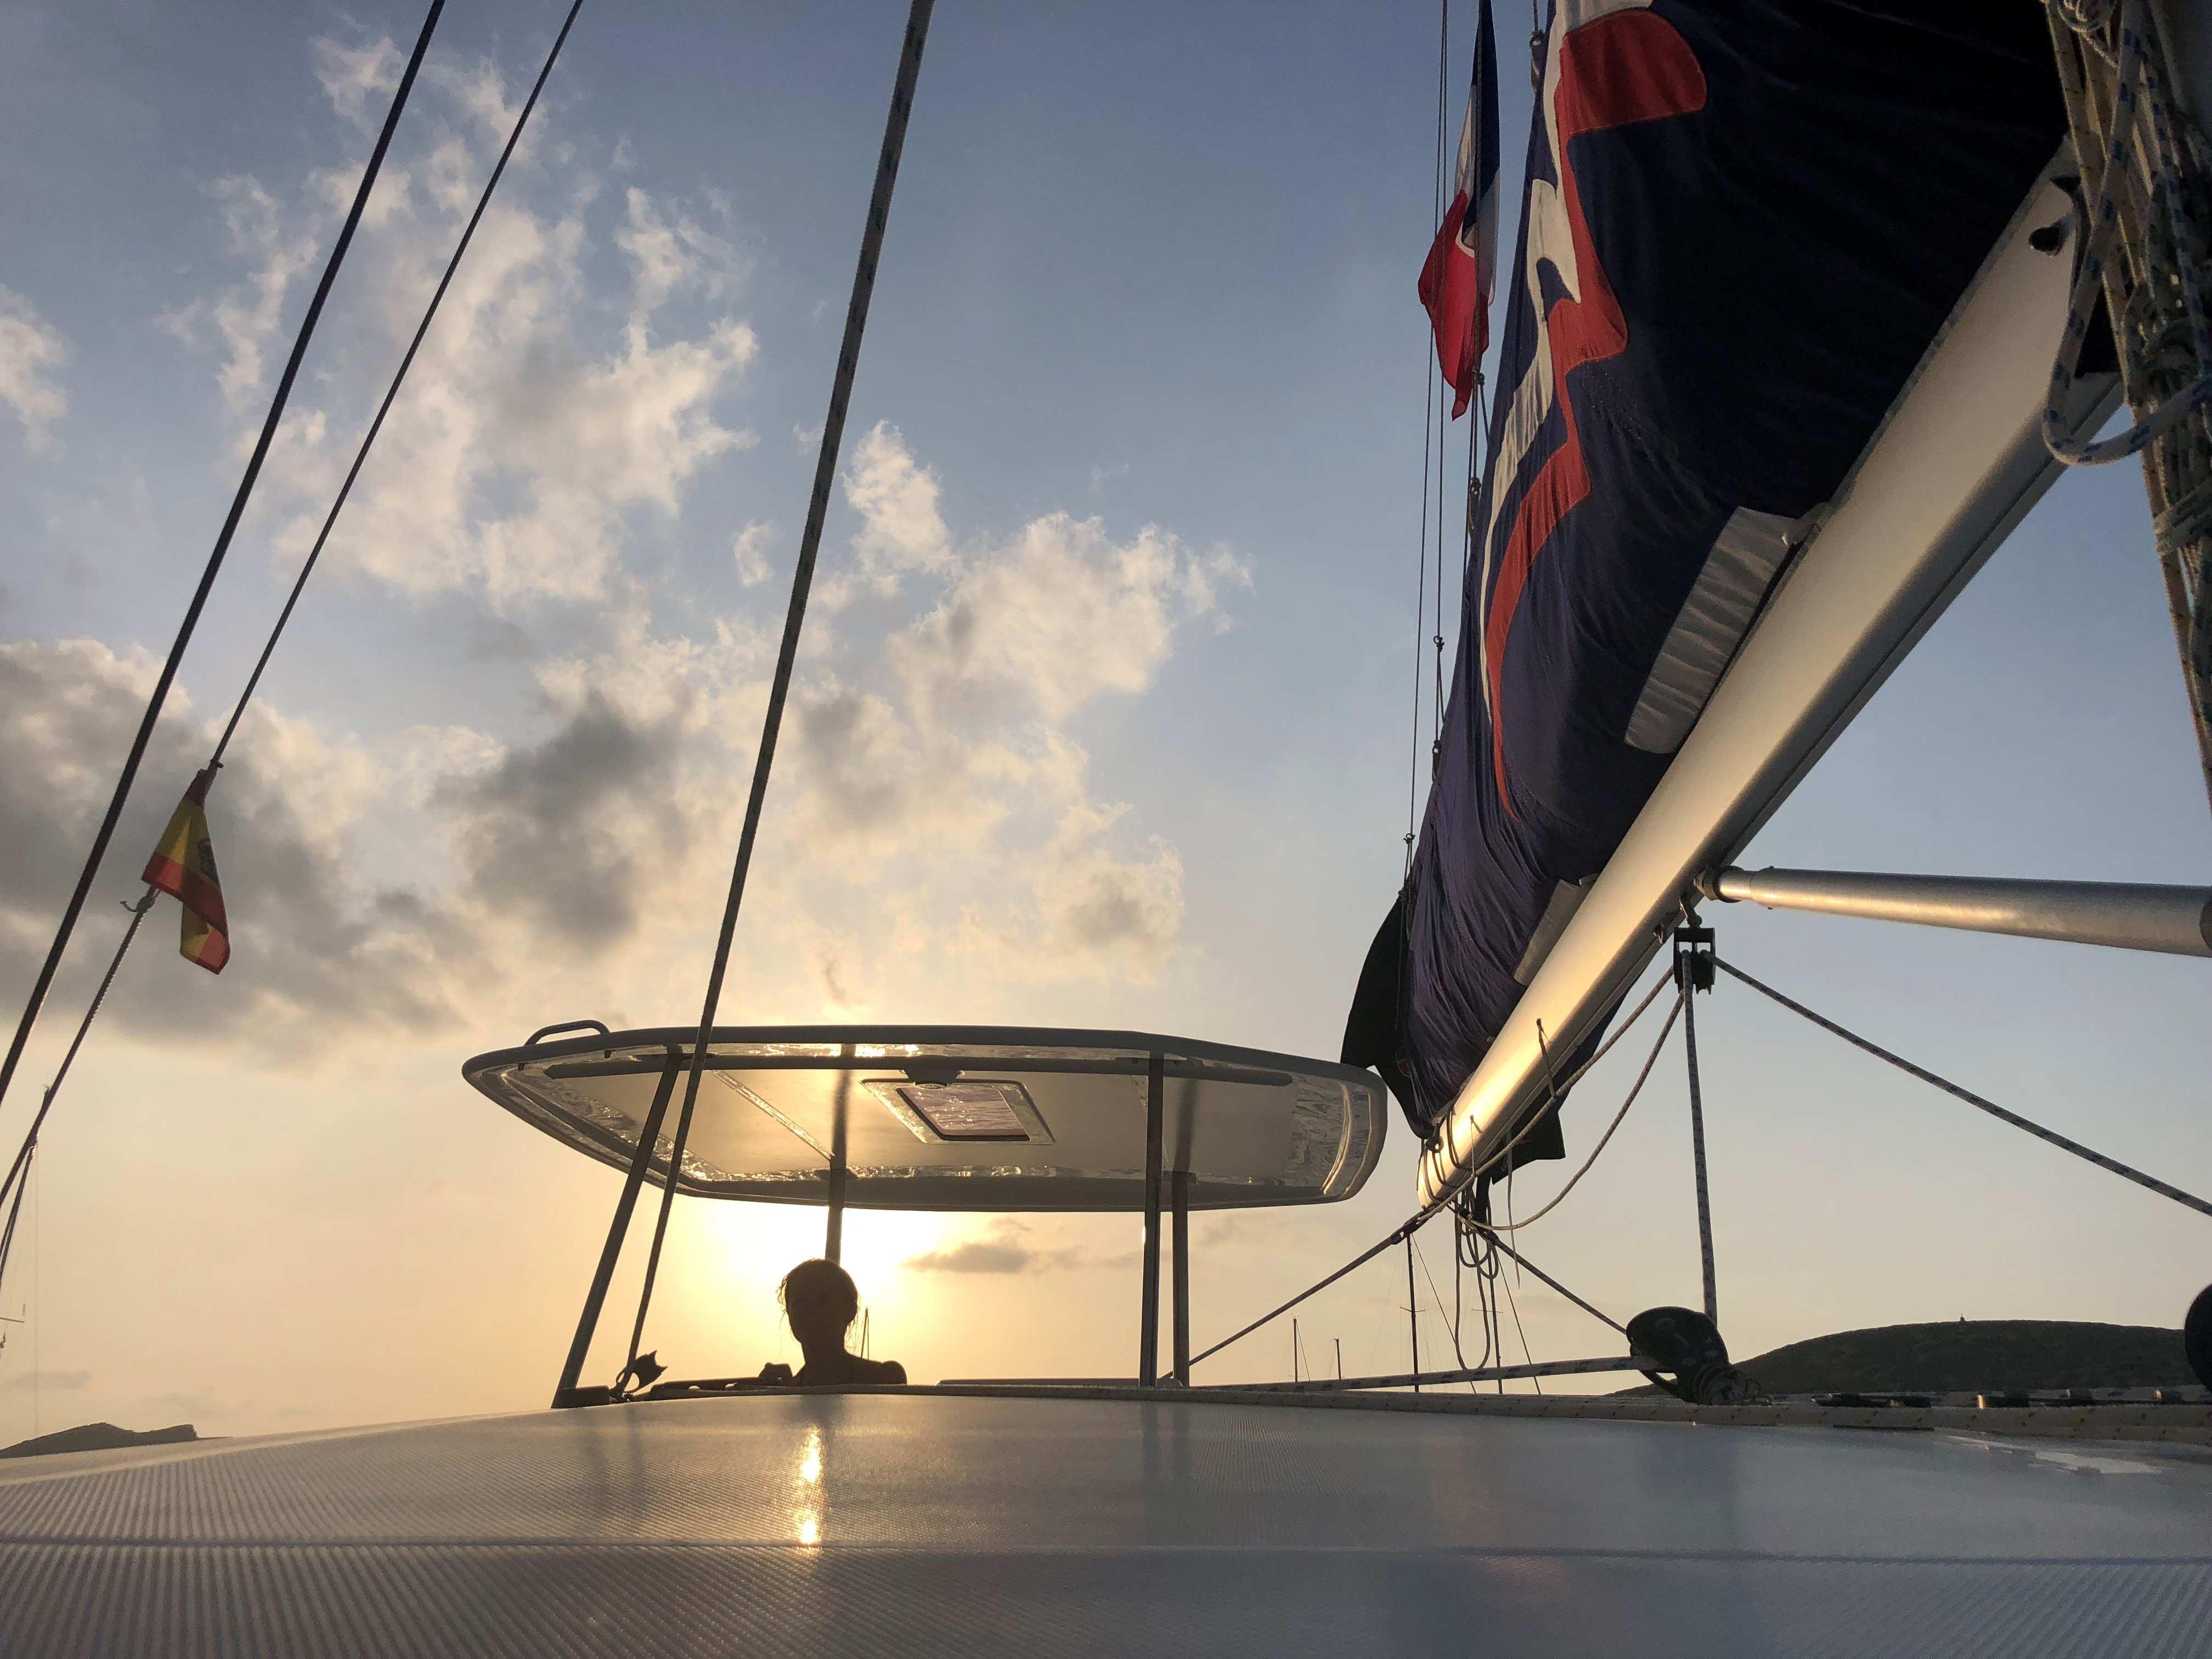 Jovita,the Moorings skipper in Palma